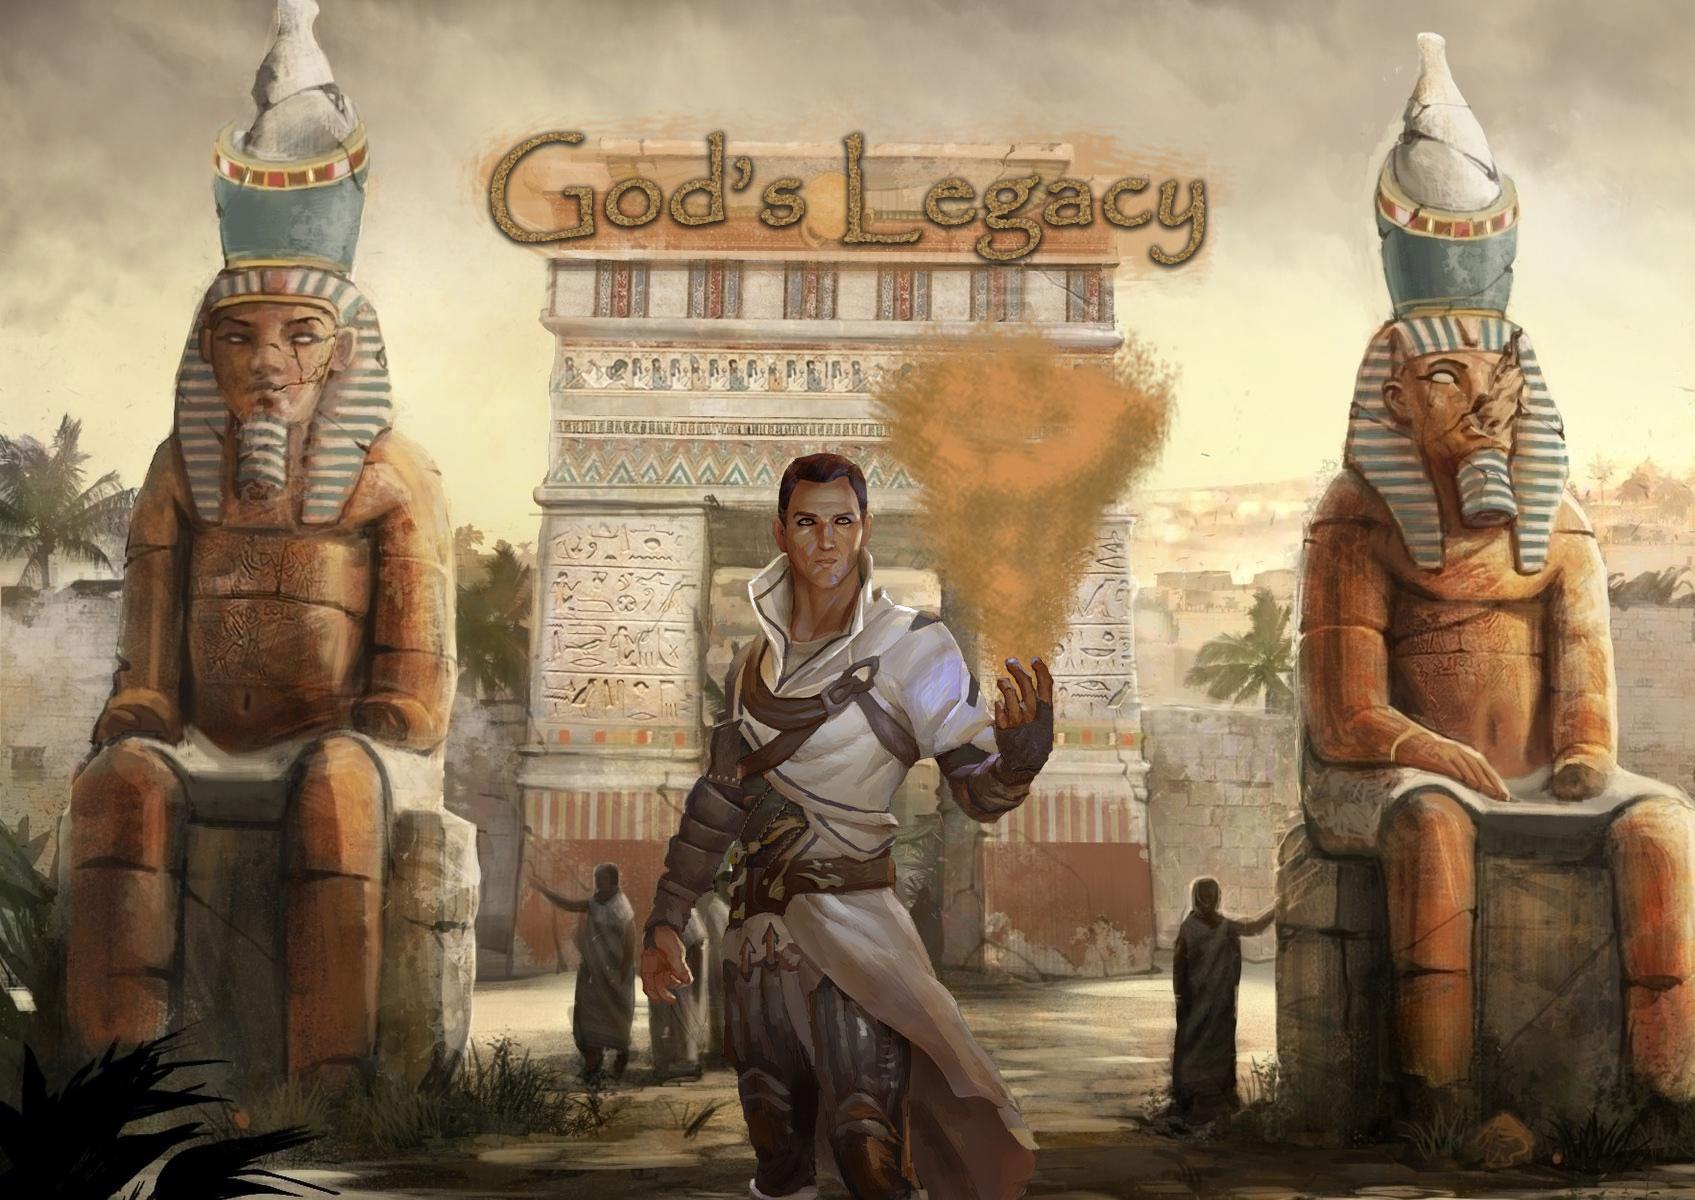 Gods Legacy